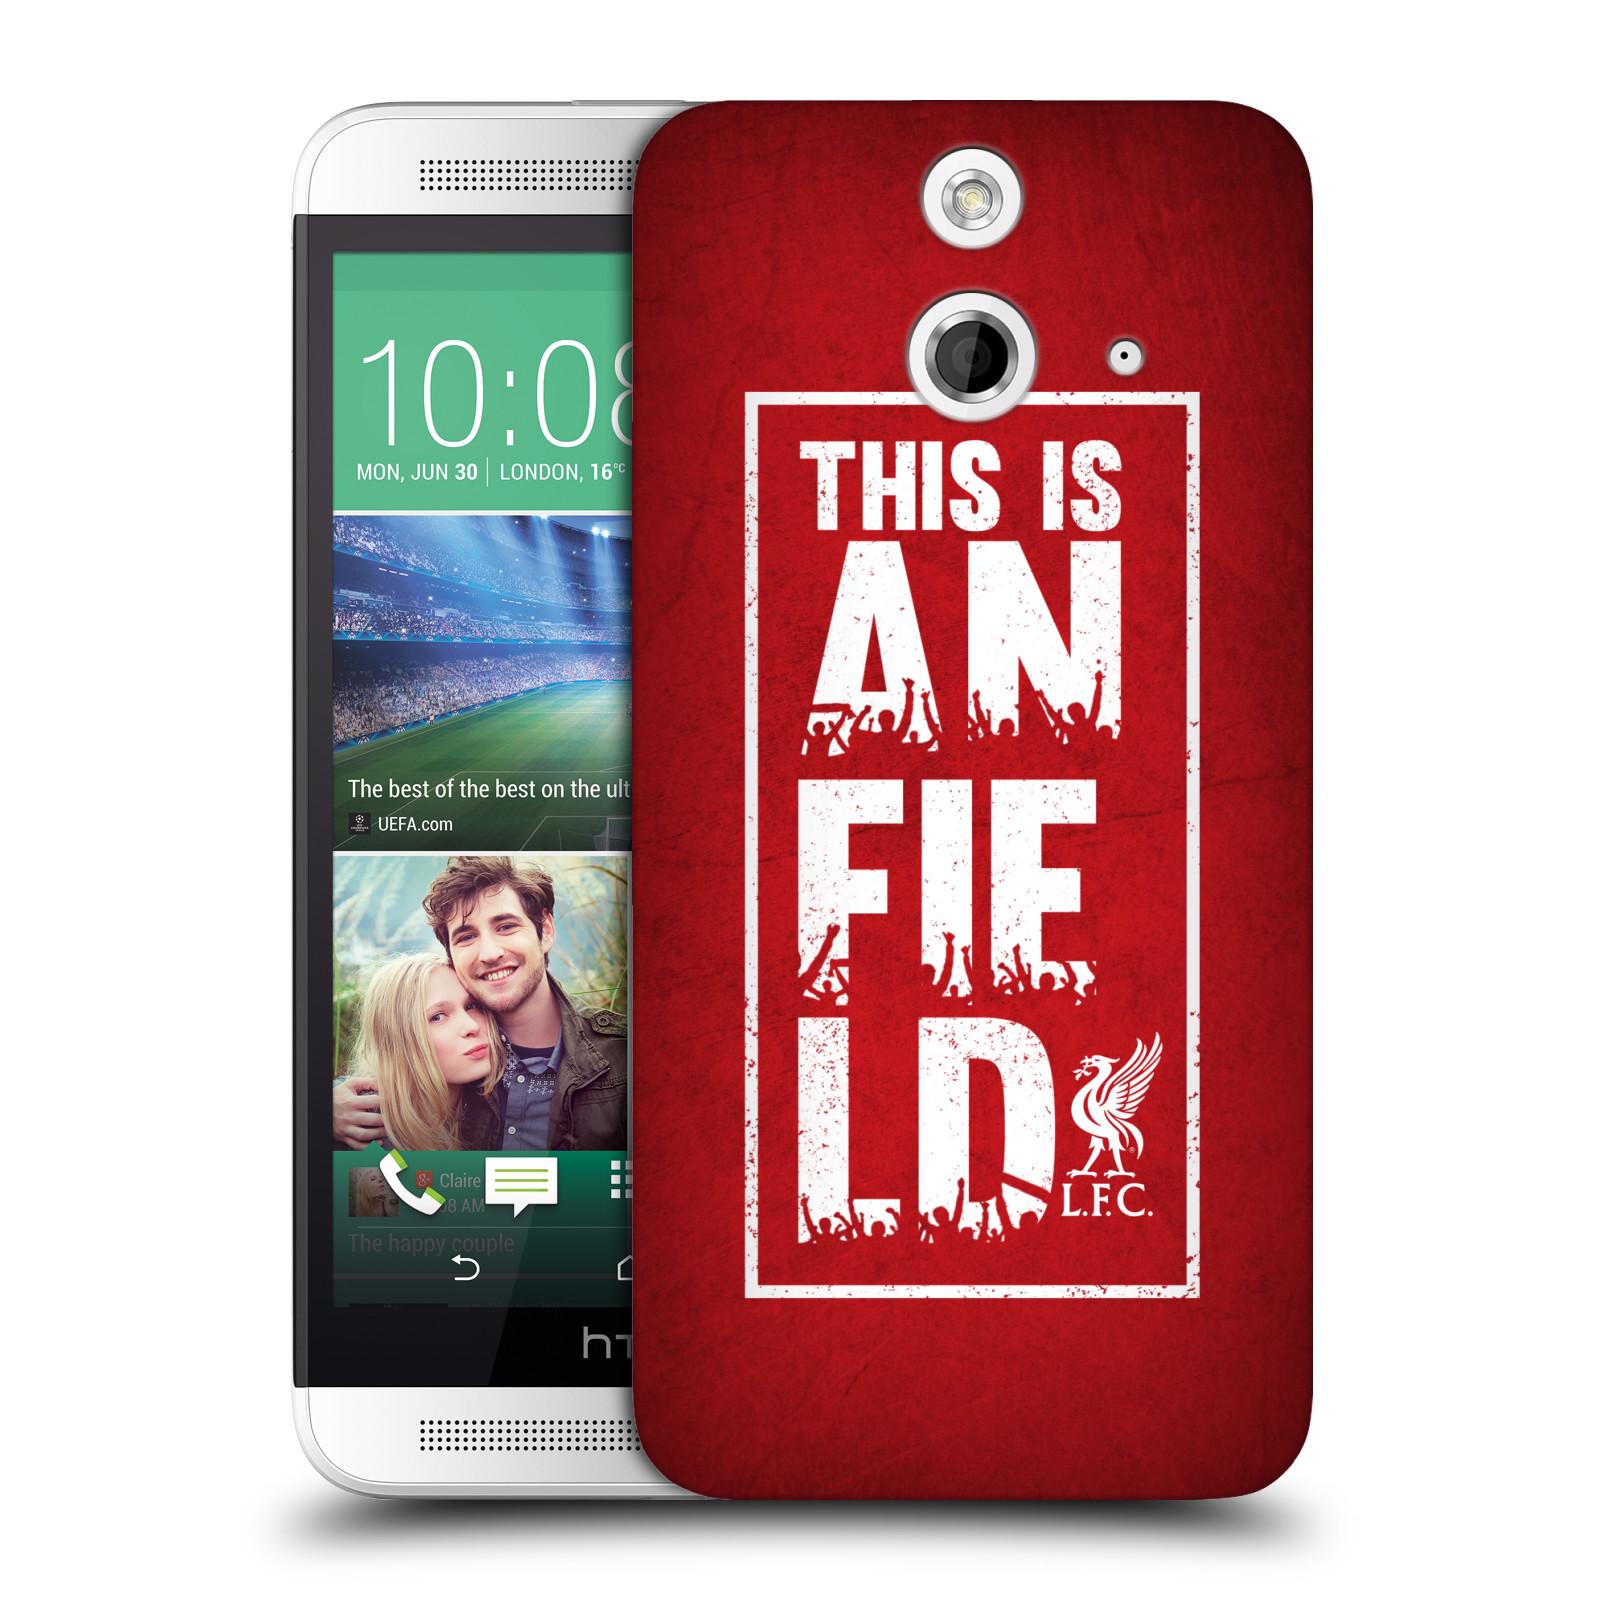 Plastové pouzdro na mobil HTC ONE E8 HEAD CASE Liverpool FC This Is Anfield Red (Kryt či obal na mobilní telefon Liverpool FC Official pro HTC ONE E8)